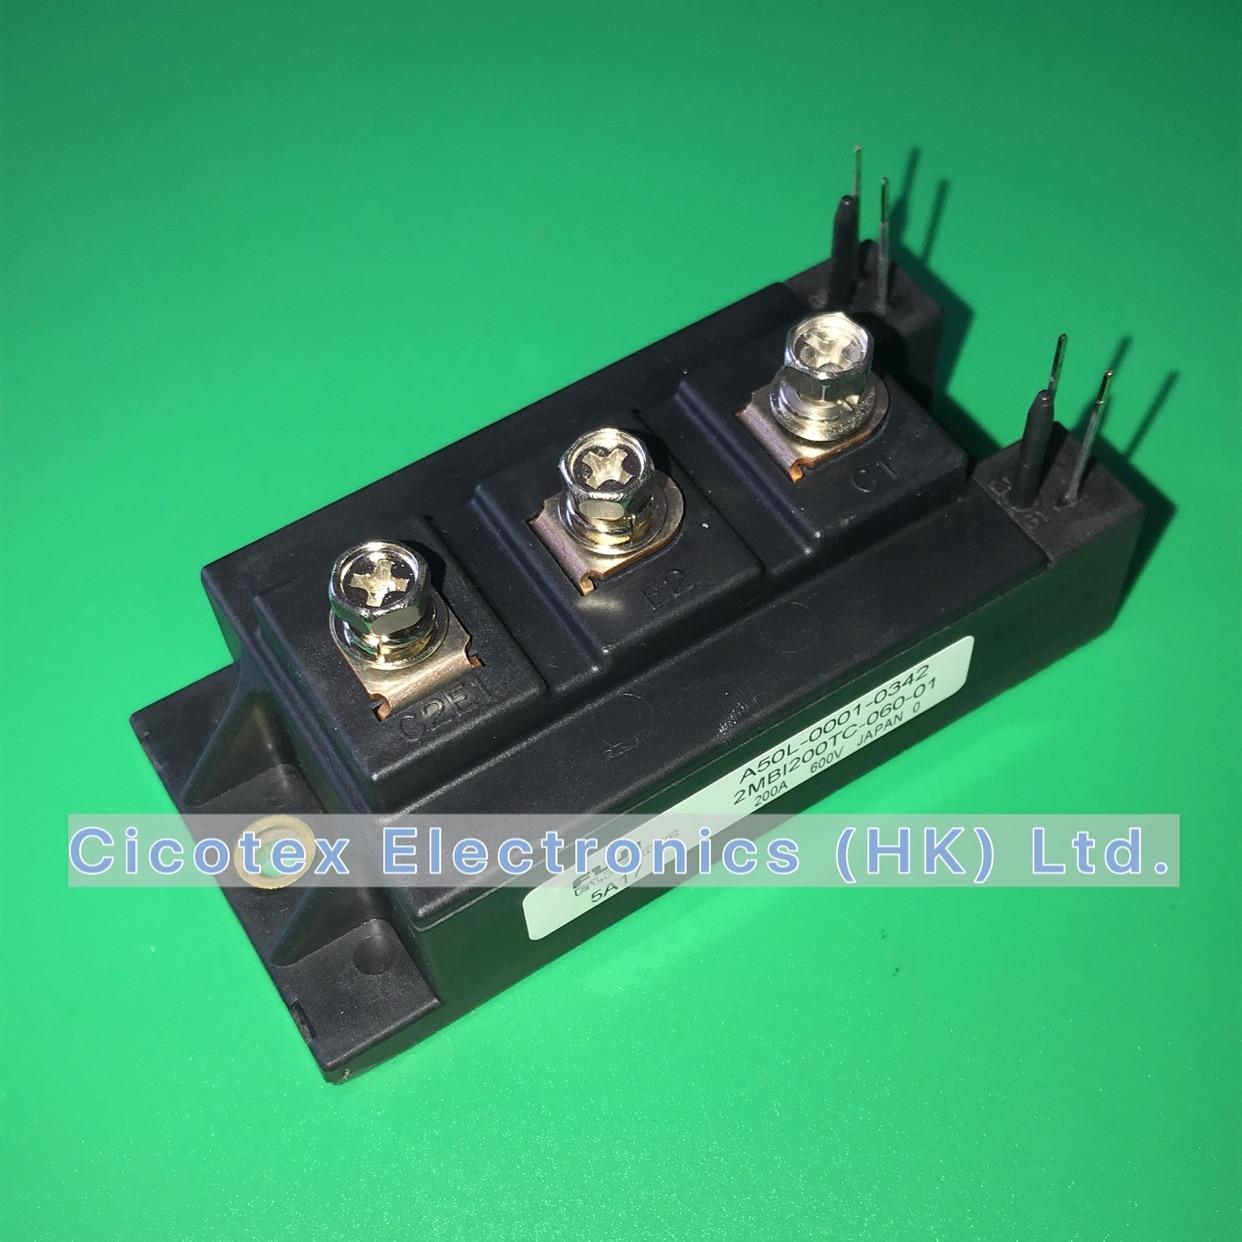 2MBI200TC 060 01 MODULE 200A 600V 2MBI200 TC 060 01 IGBT A50L 0001 0342 2MBI200TC060 01|free|module|  - title=